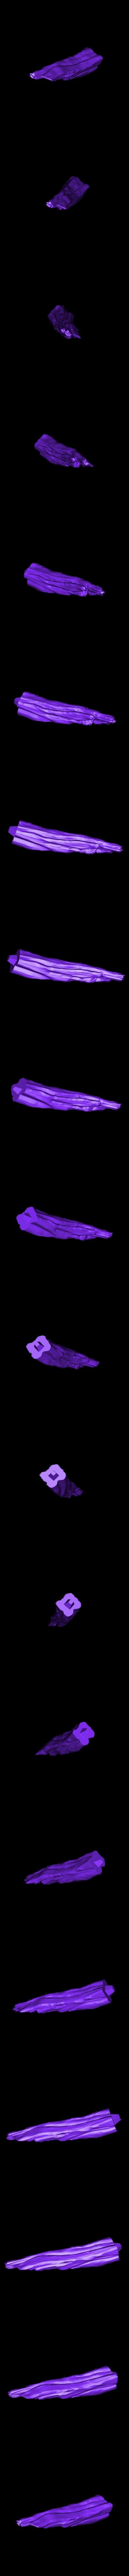 Base2_225mm.stl Download STL file Hulk Angry - Super Hero - Marvel 3D print model • 3D print model, Bstar3Dart